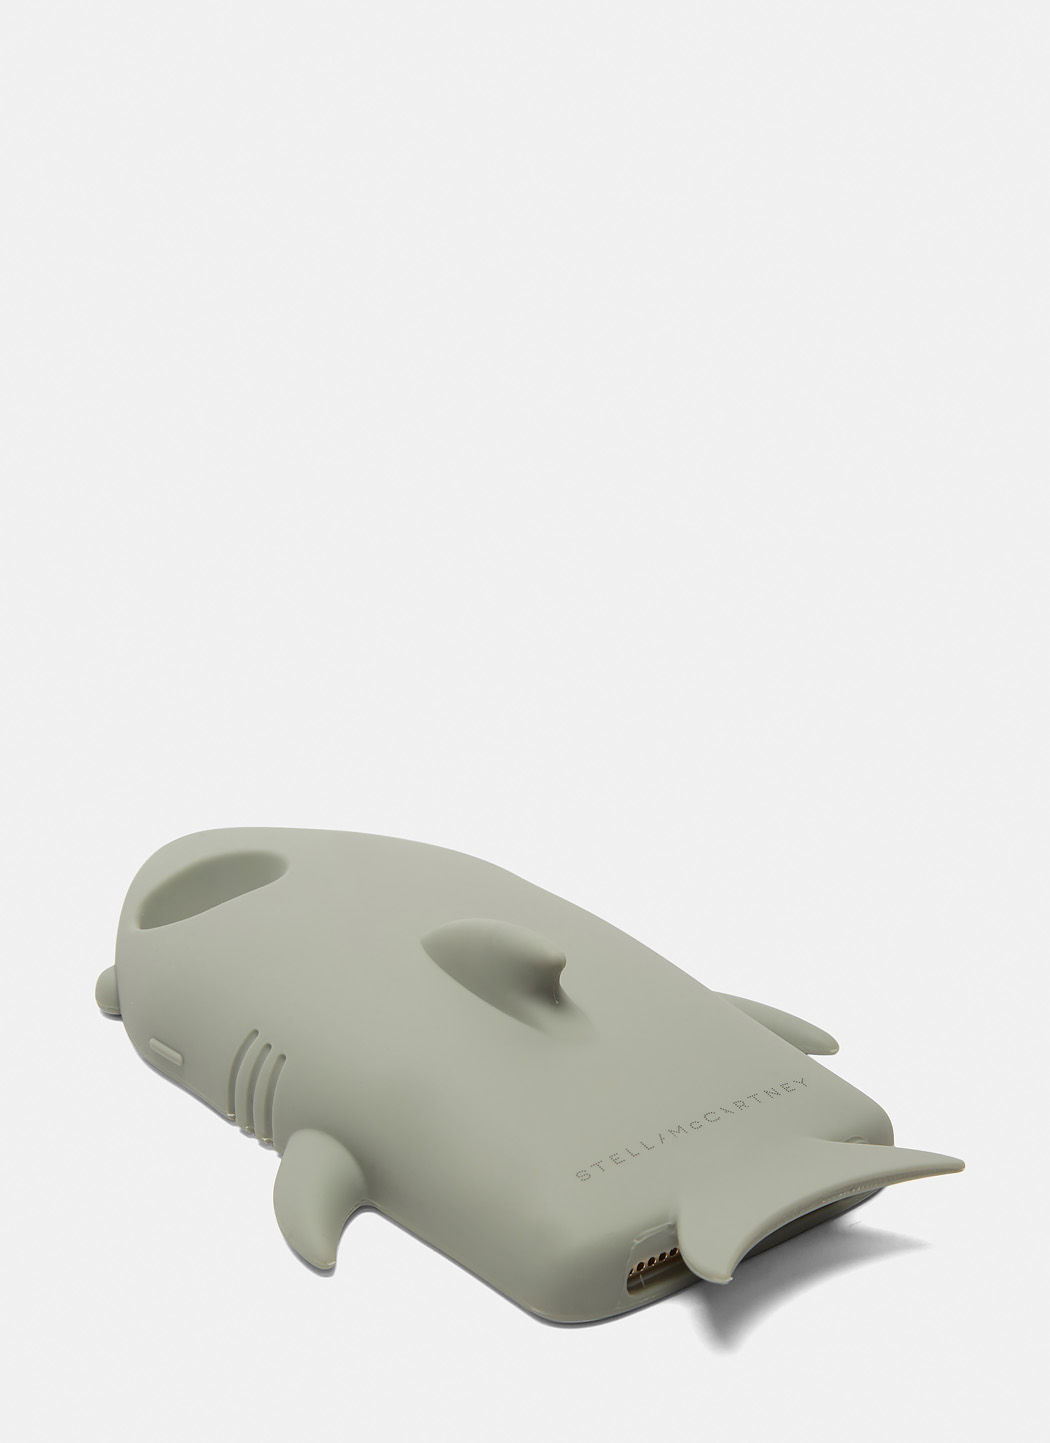 STELLA MCCARTNEY Shark Gummy Silicon Iphone 6 Case, Grey in Gray